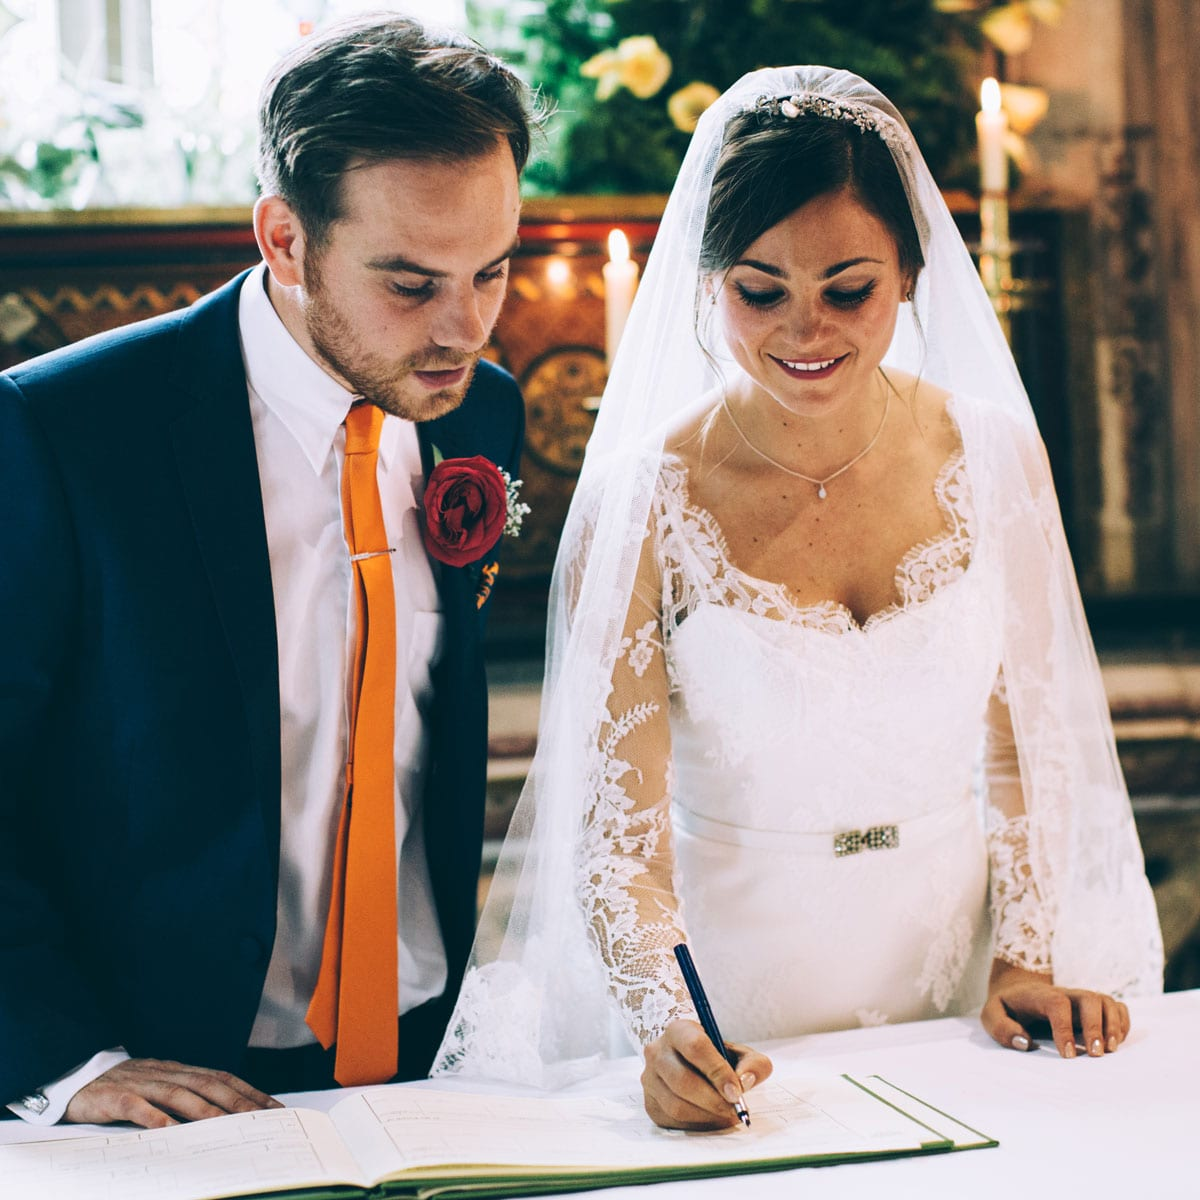 Bespoke Wedding Dress Design - Cherry Williams London